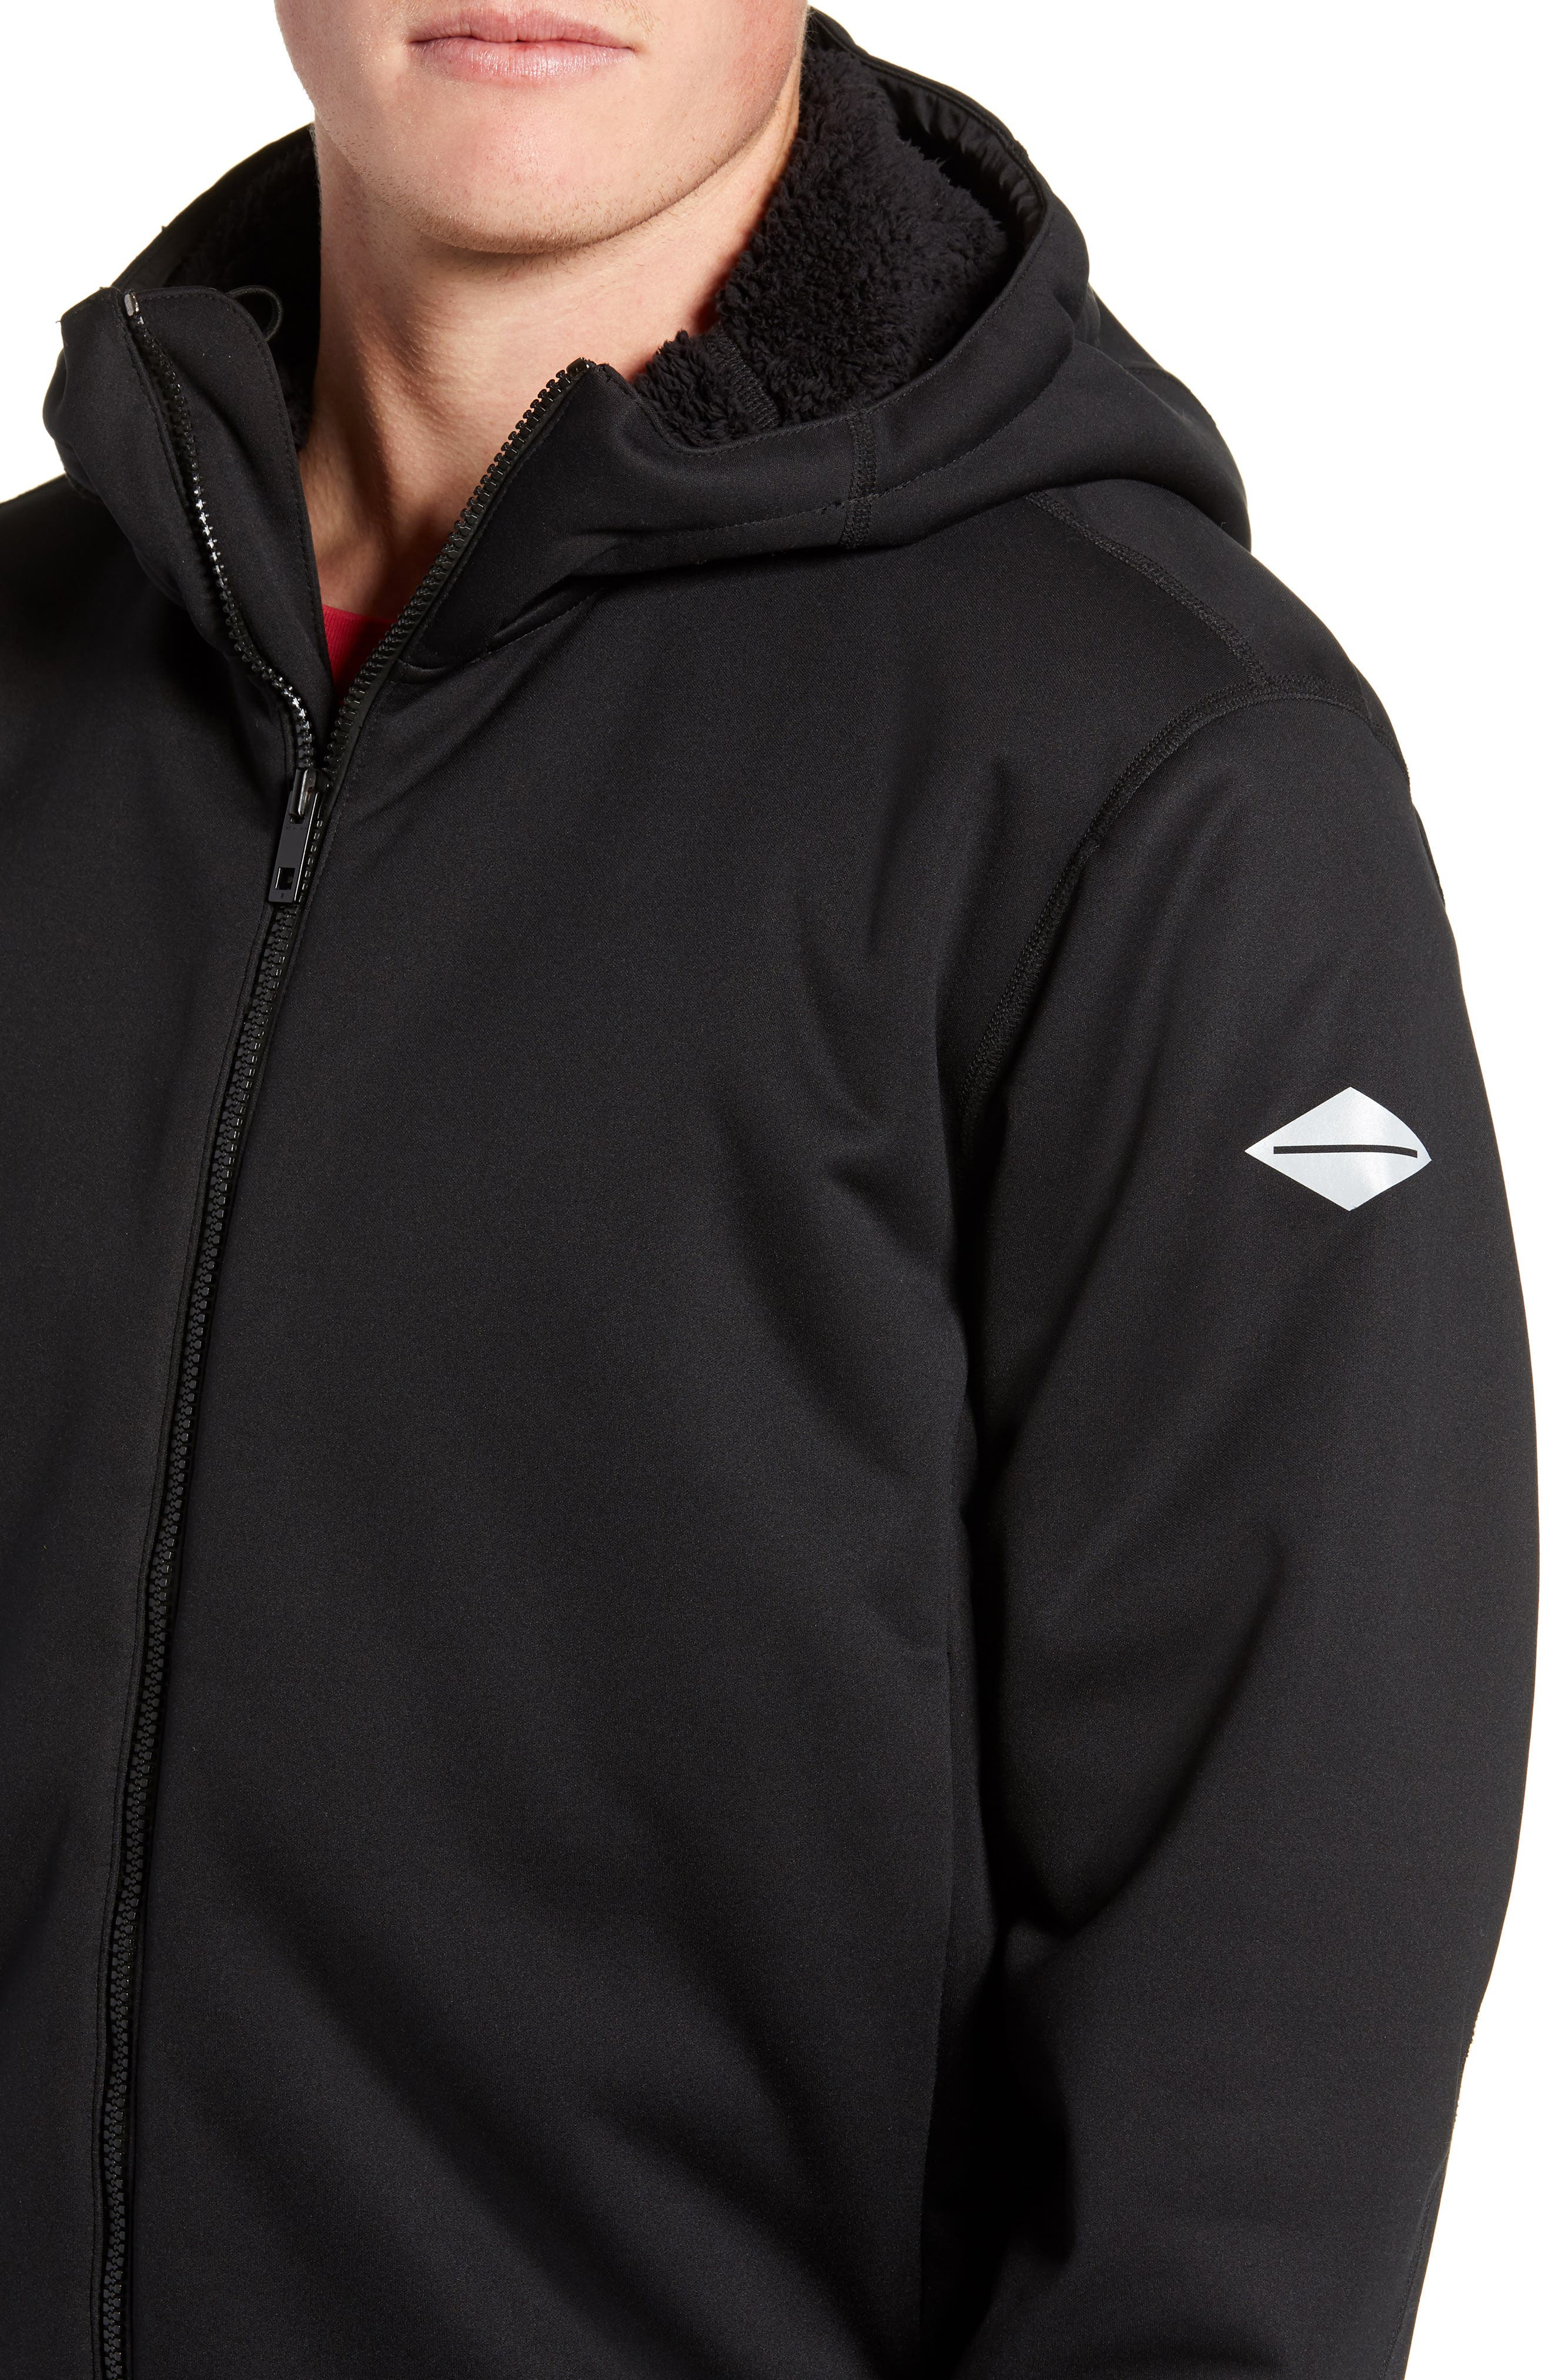 Tactic Hooded Fleece Jacket,                             Alternate thumbnail 4, color,                             BLACK